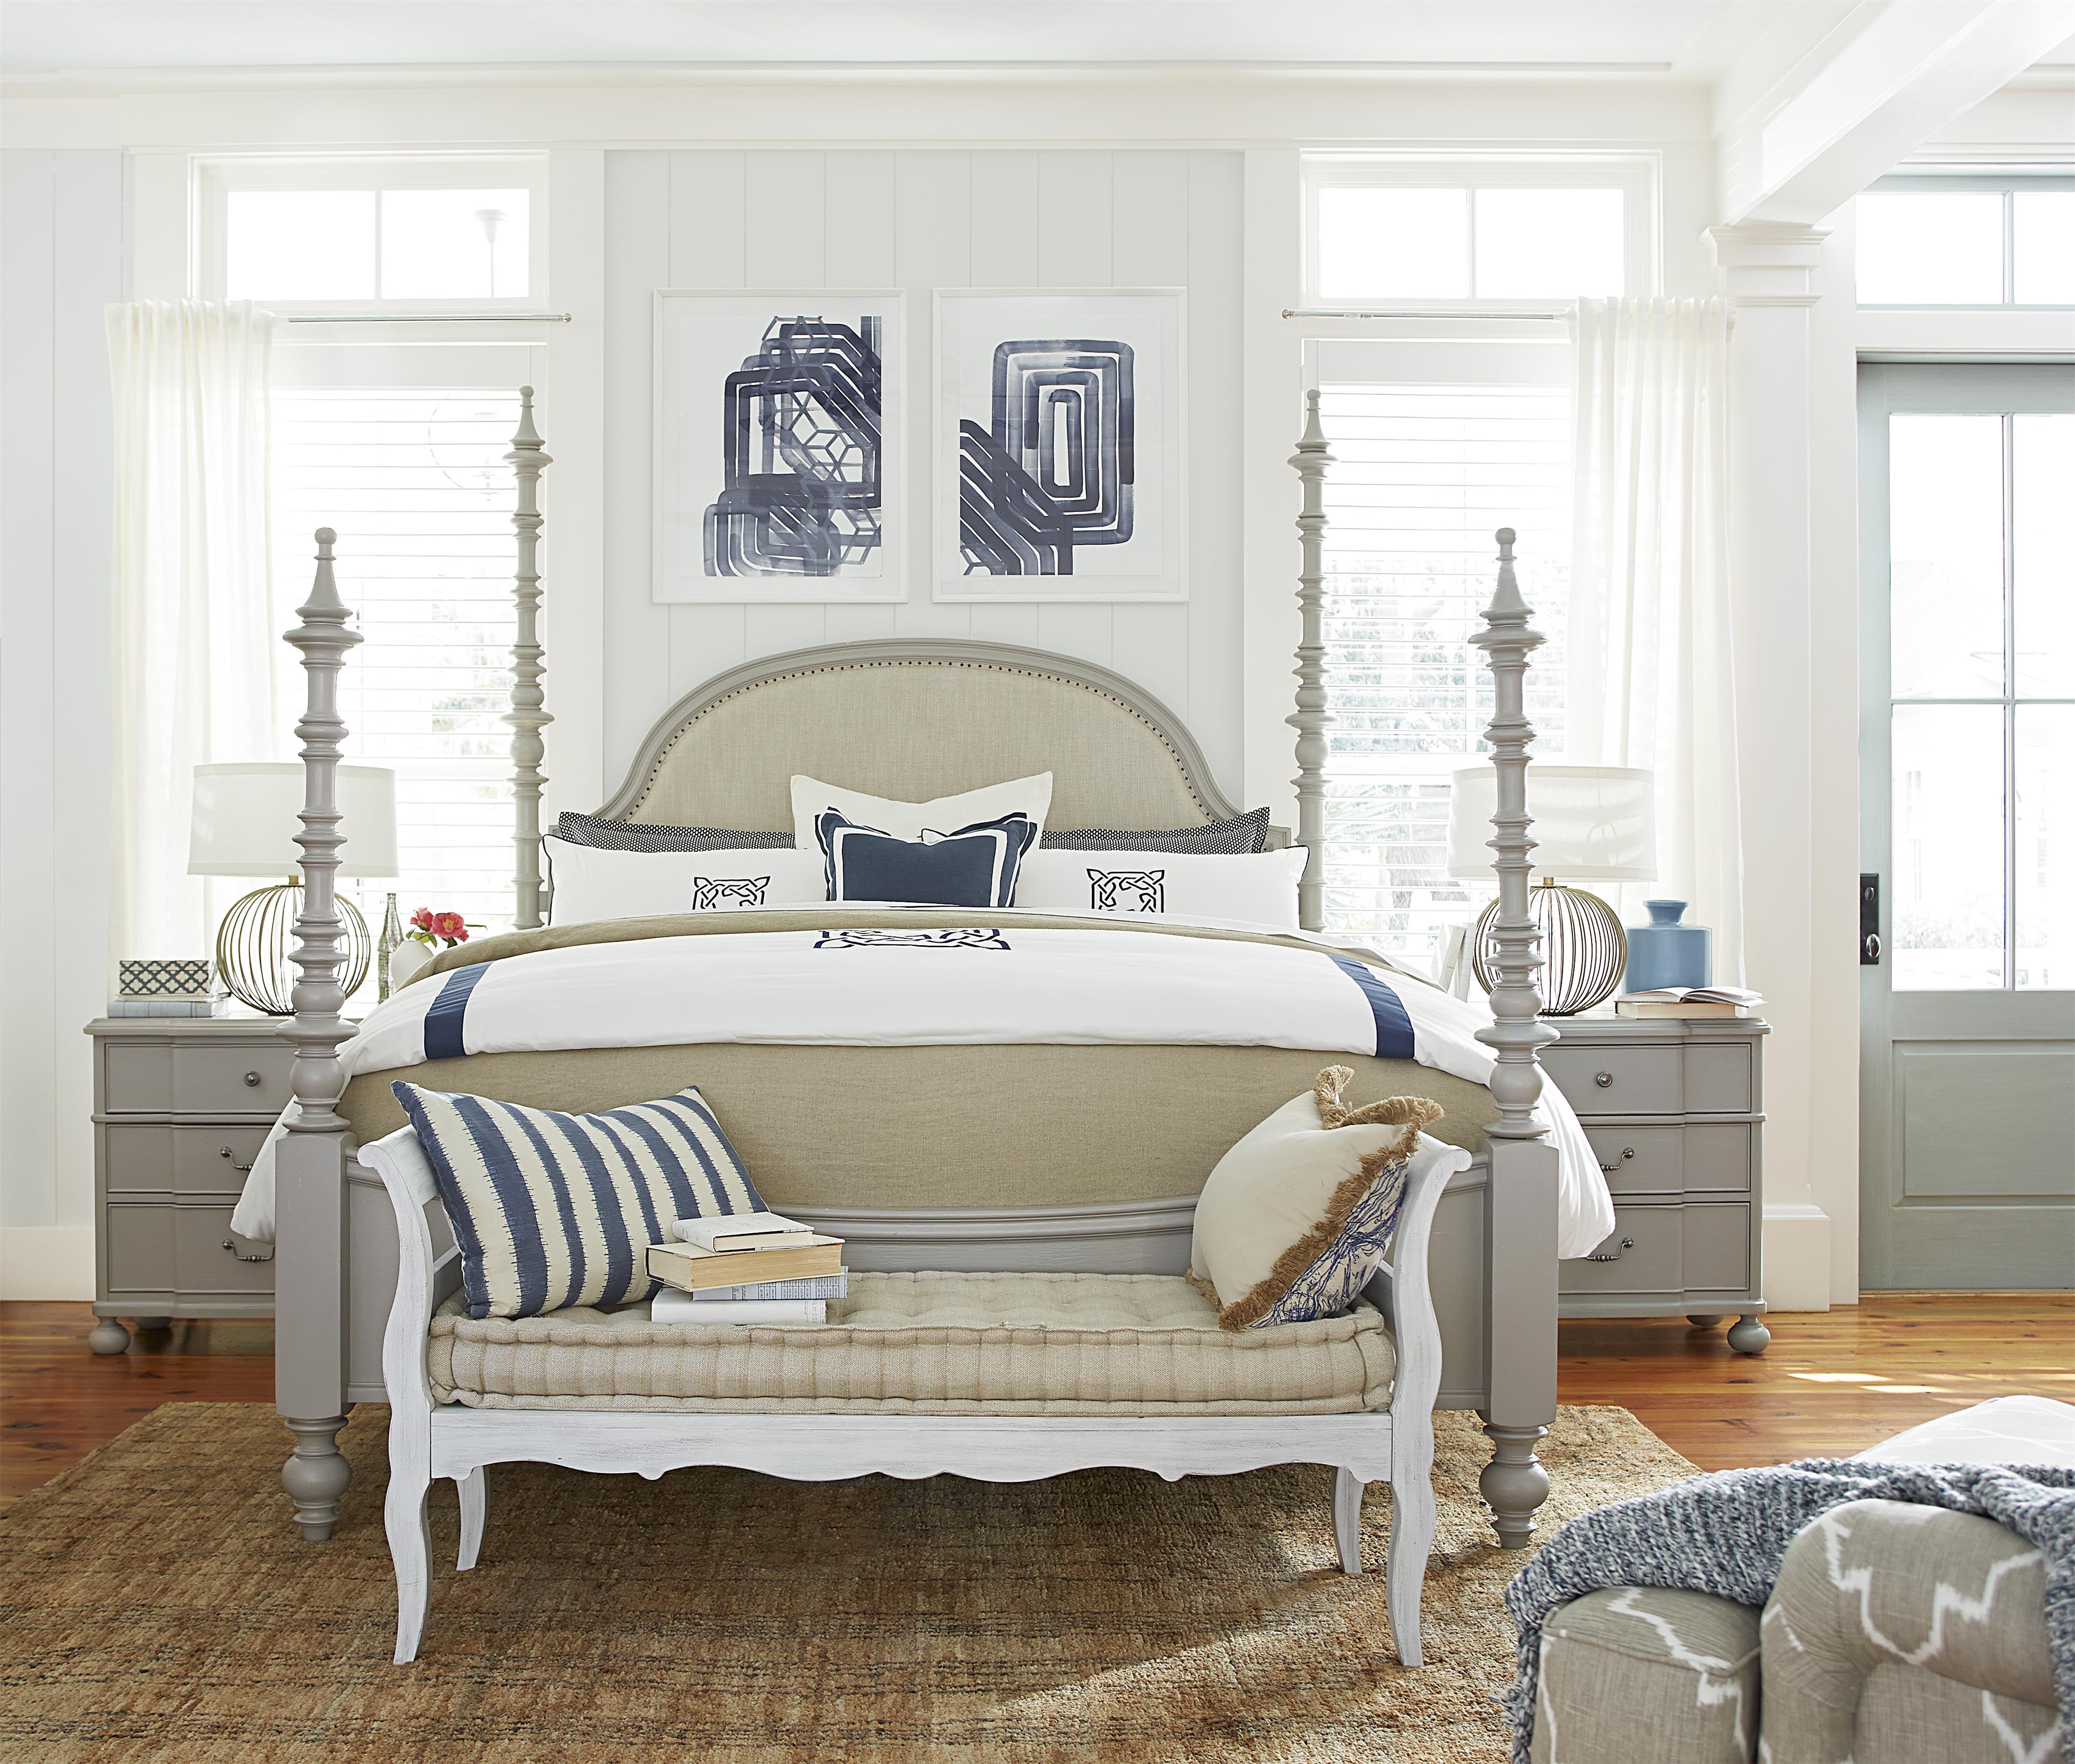 Paula Deen by Universal Dogwood Queen Bedroom Group - Item Number: 599 Q Bedroom Group 1